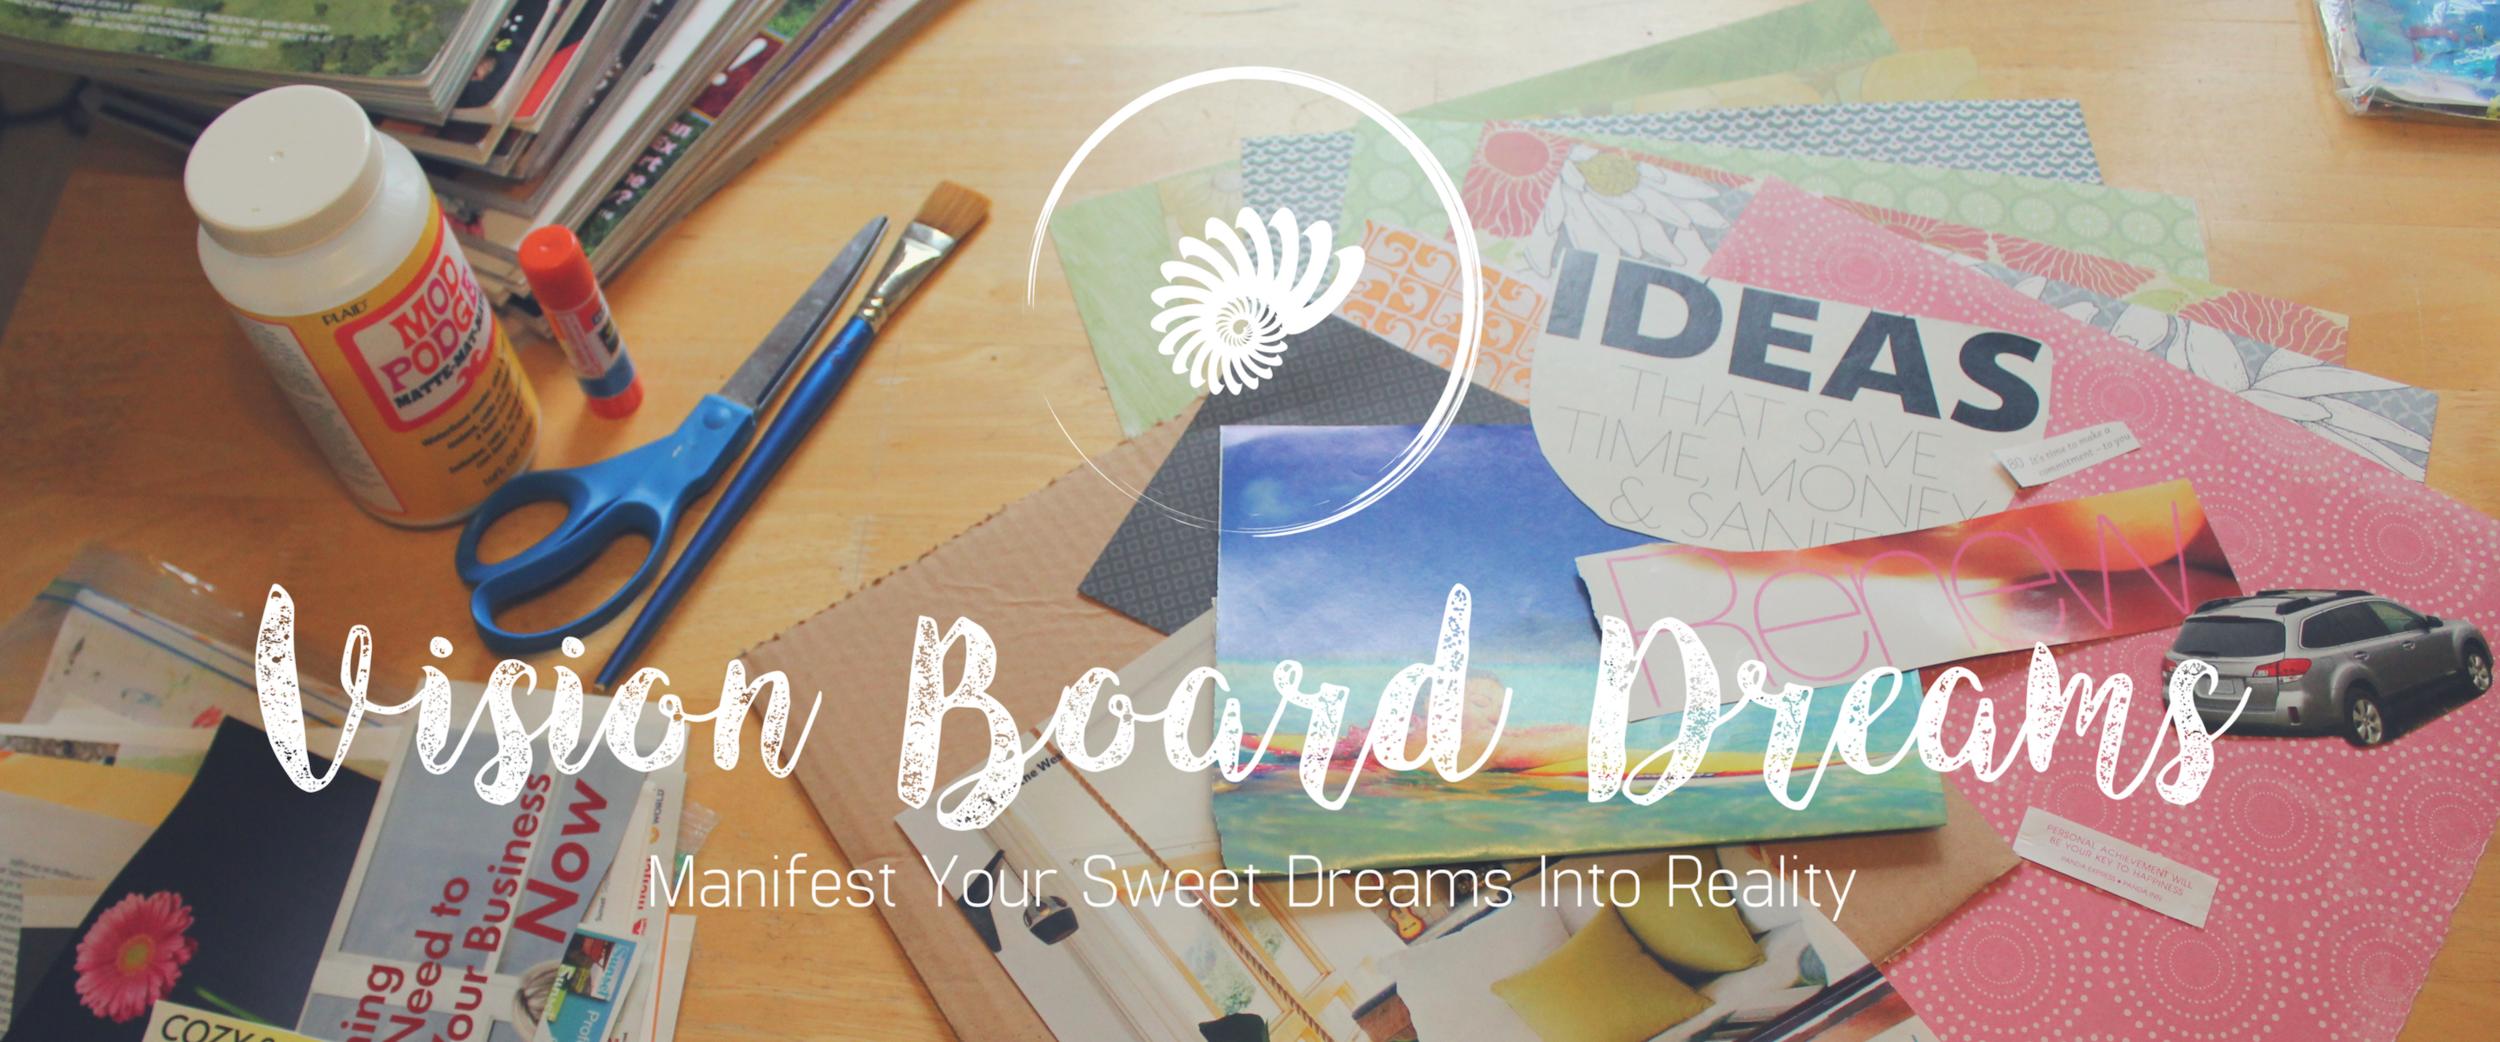 vision board dreams background 1000x575 (4)